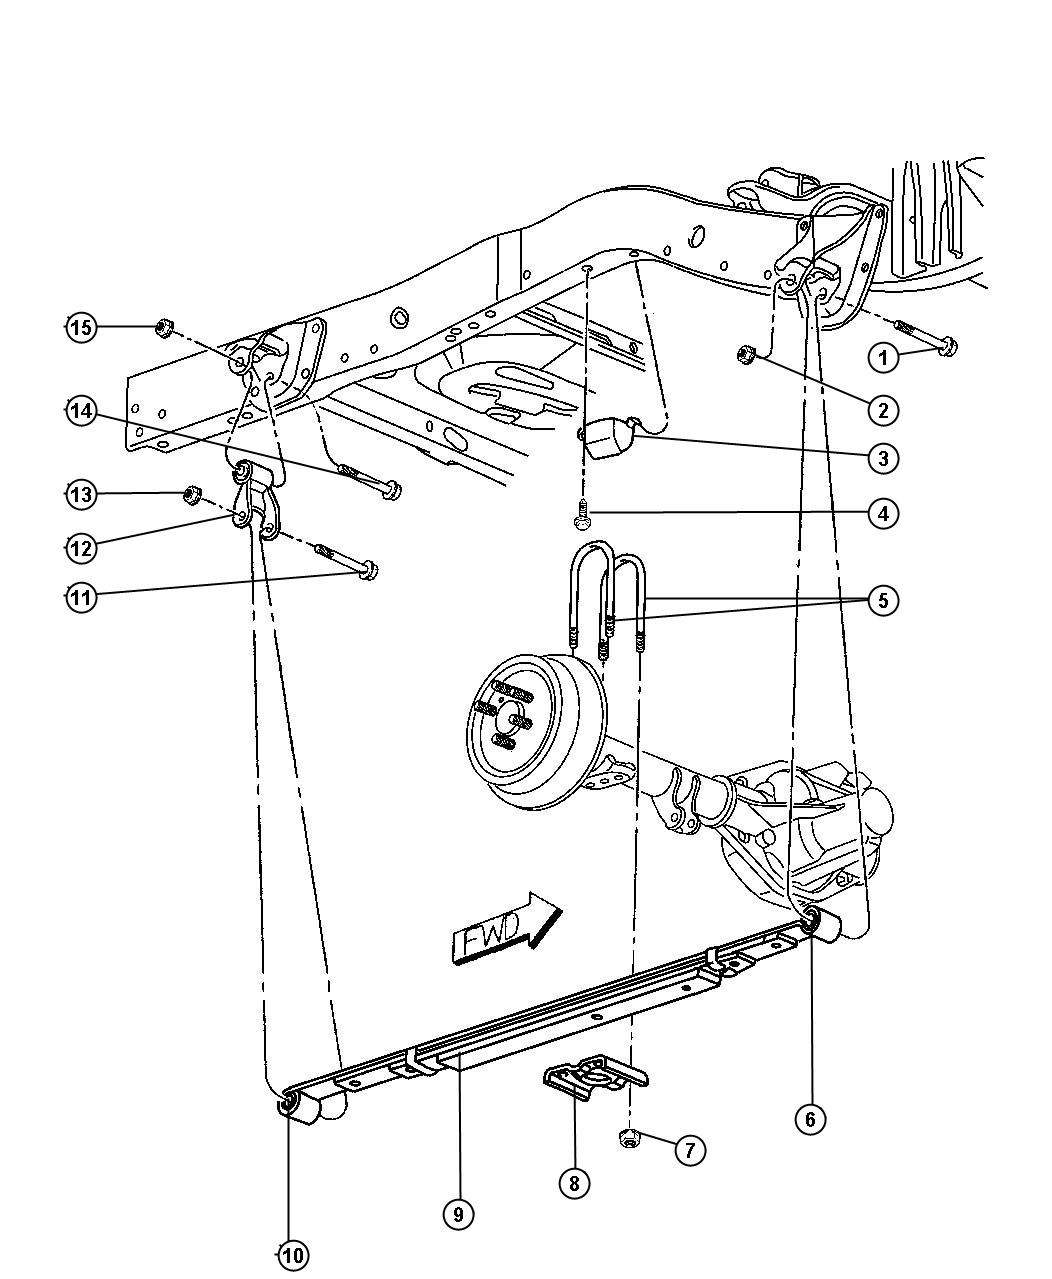 1997 dodge dakota 56021624 parts diagram  dodge  auto